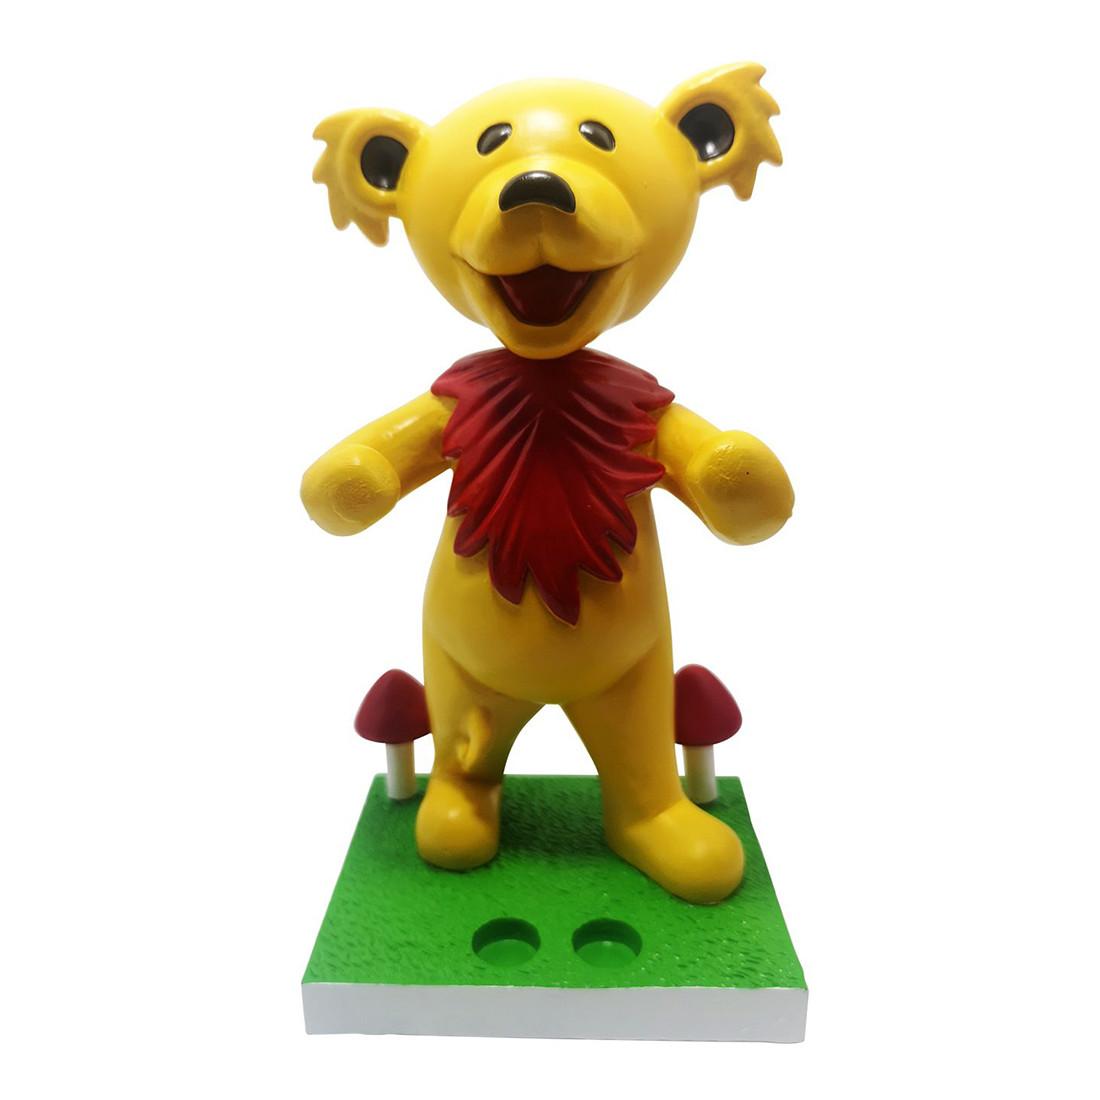 GD Bobblehead Dancing Bear Yellow Holder